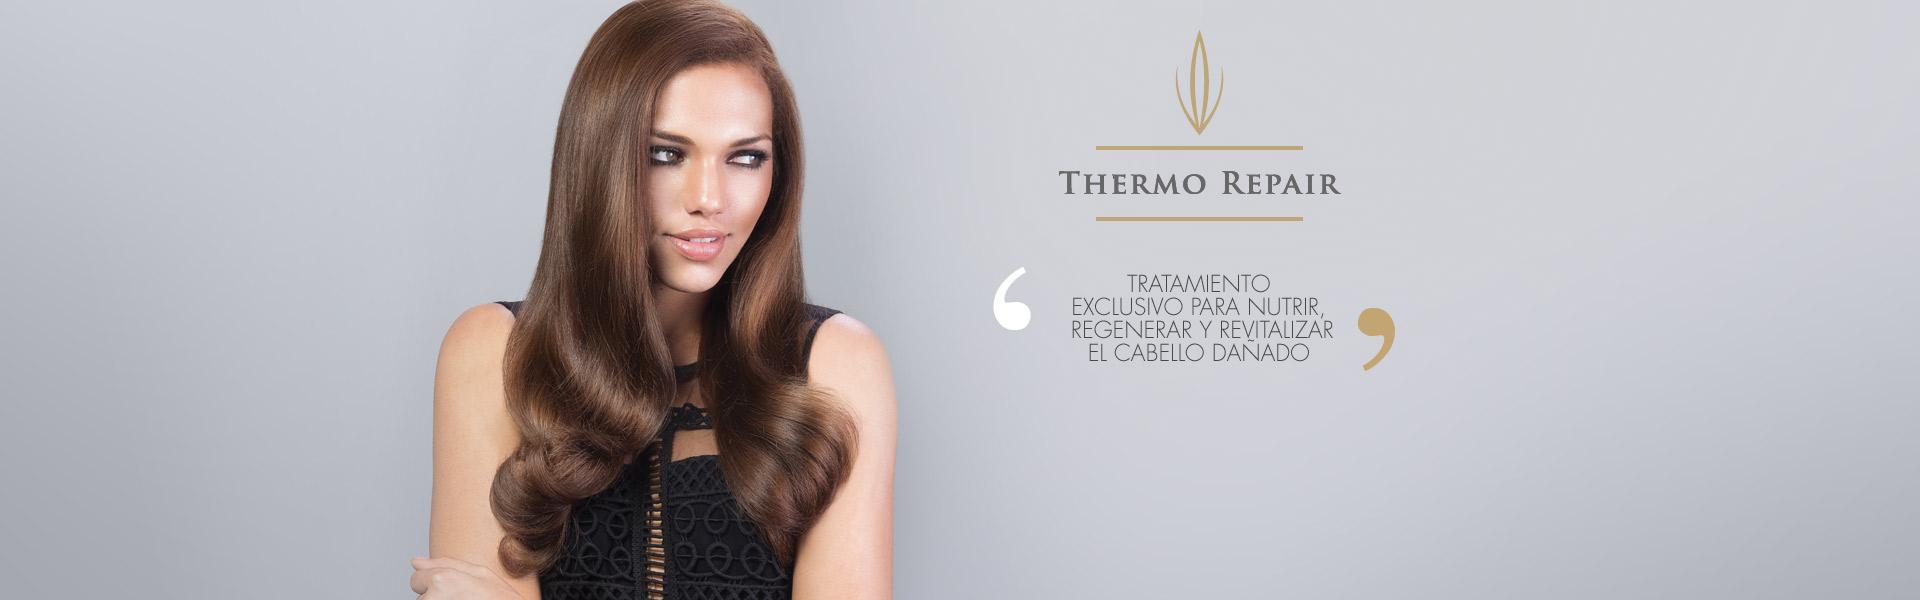 thermo_repair_es